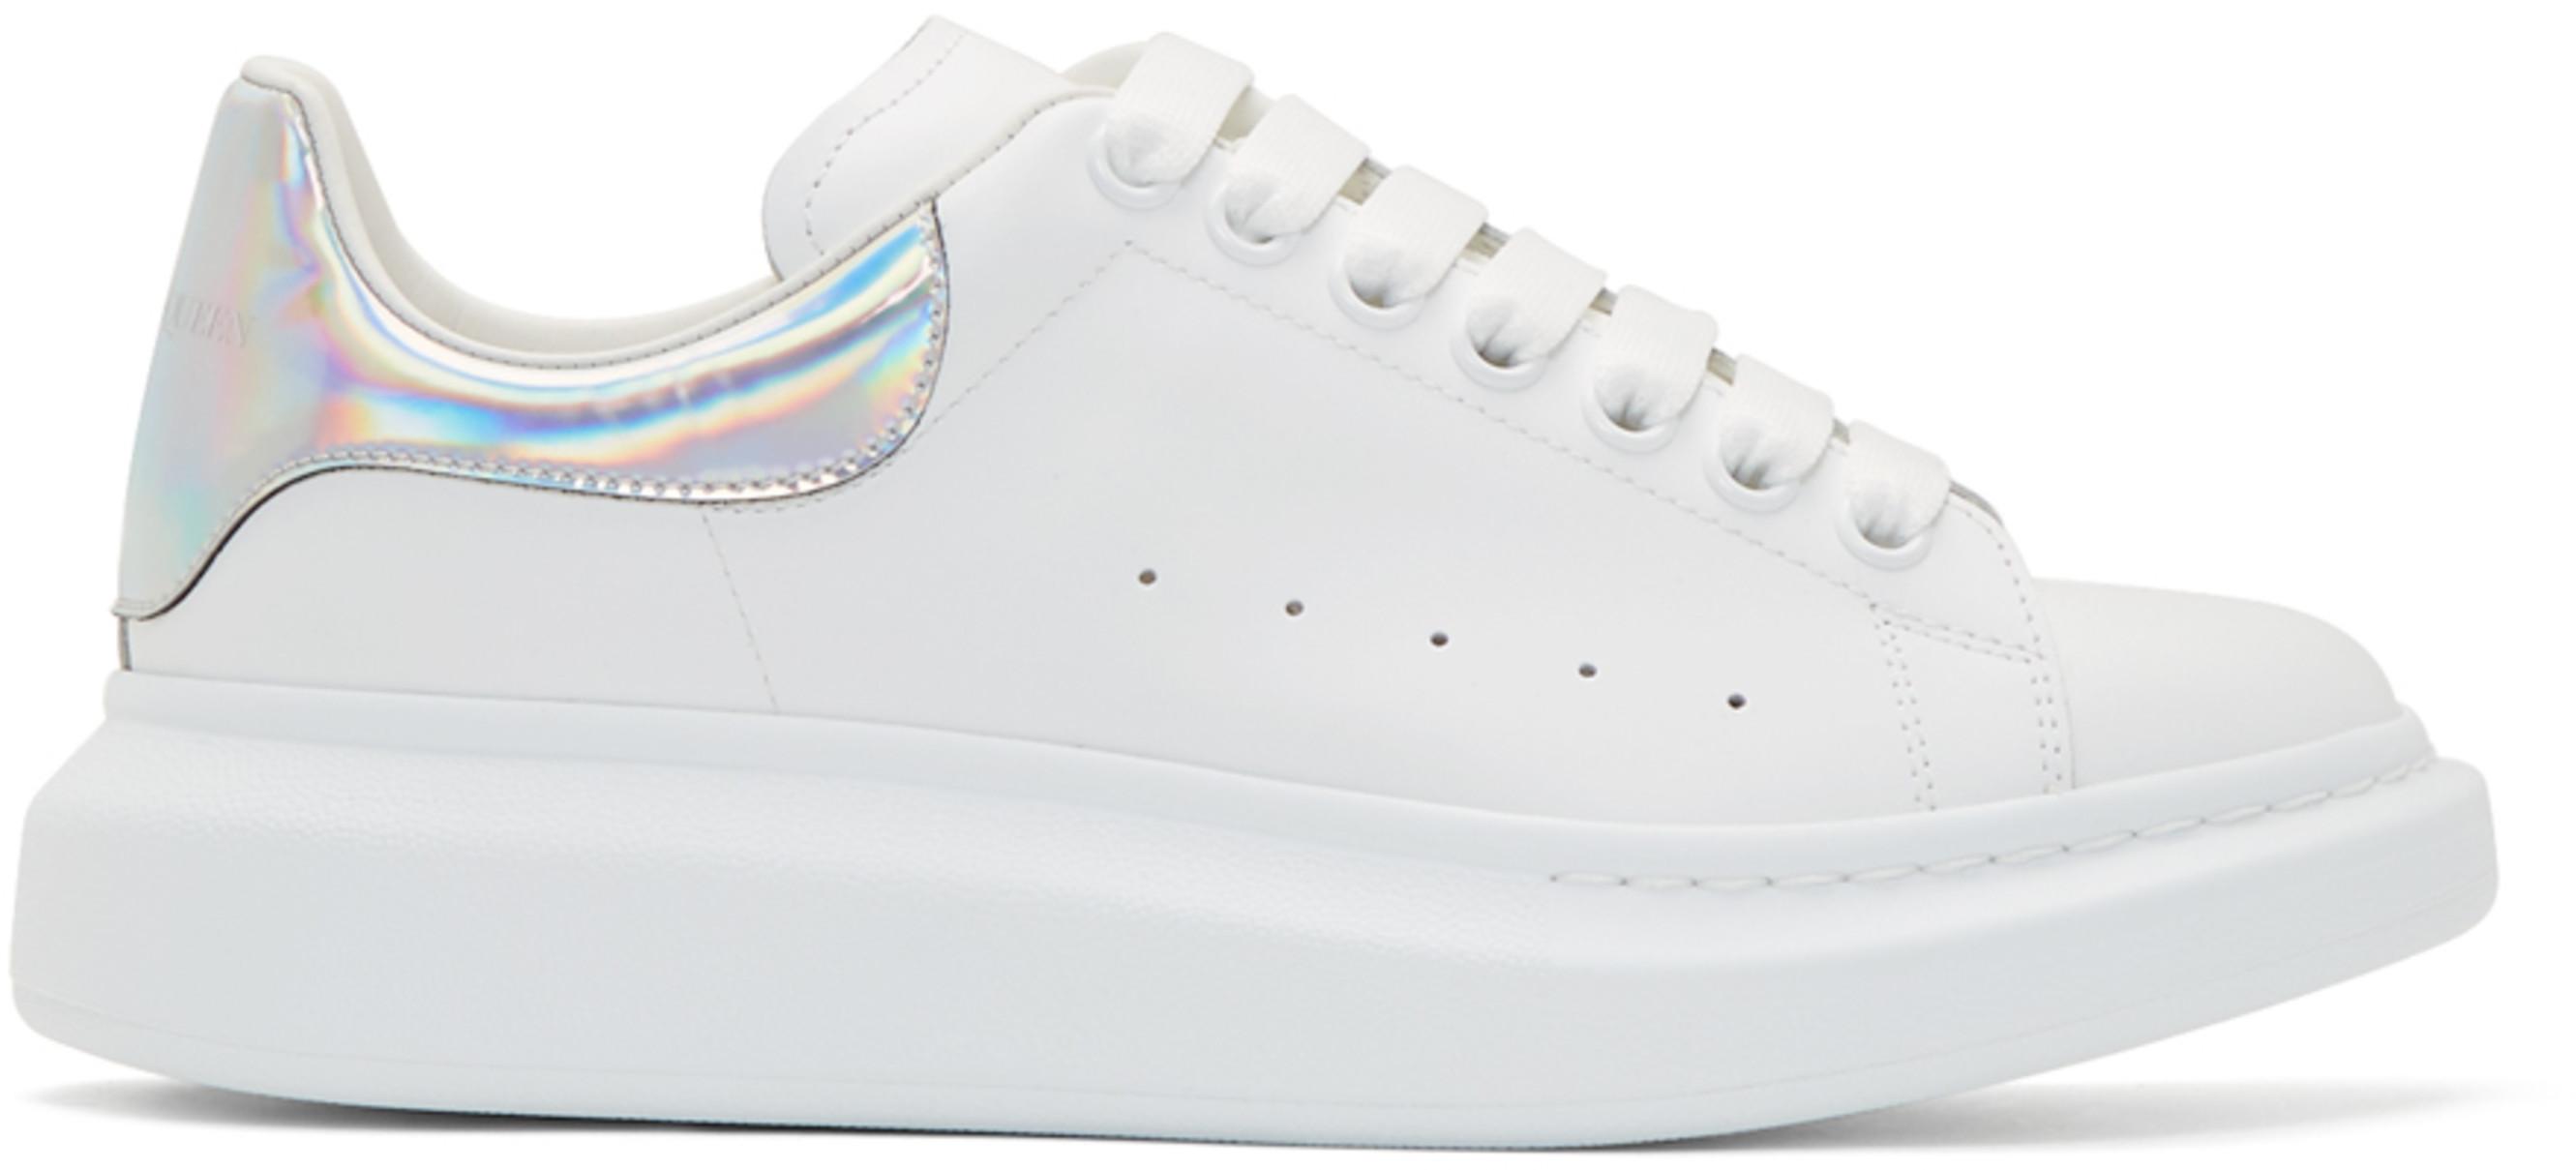 c4aa7e8ce85d9 Alexander Mcqueen shoes for Men | SSENSE